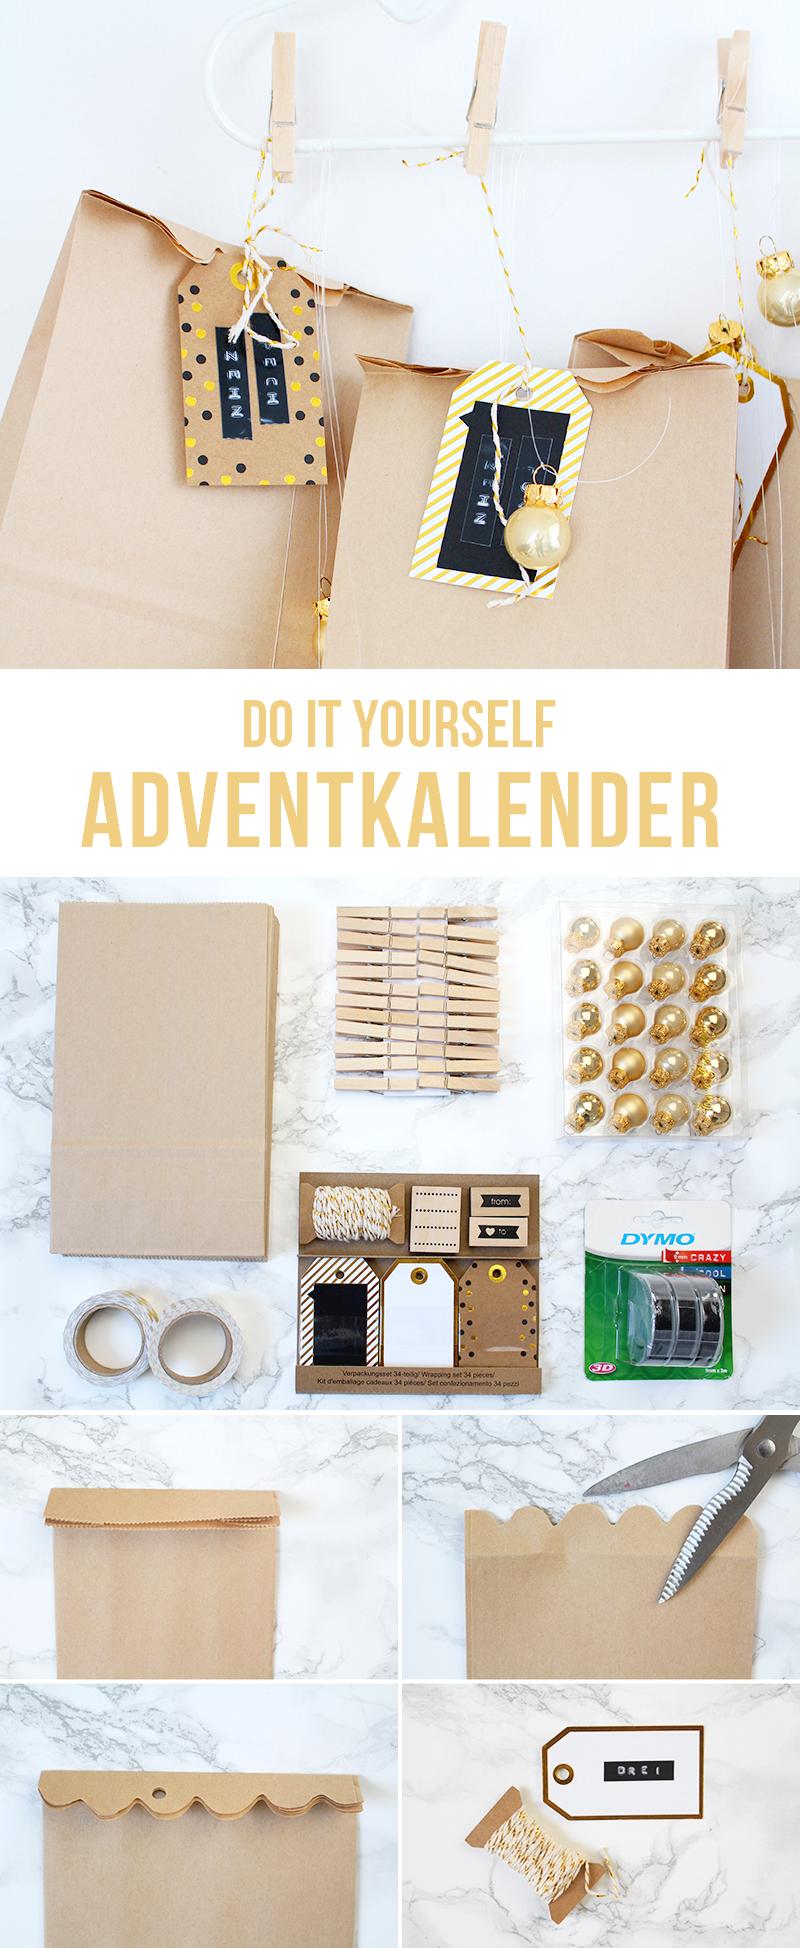 DIY: Adventskalender selber machen